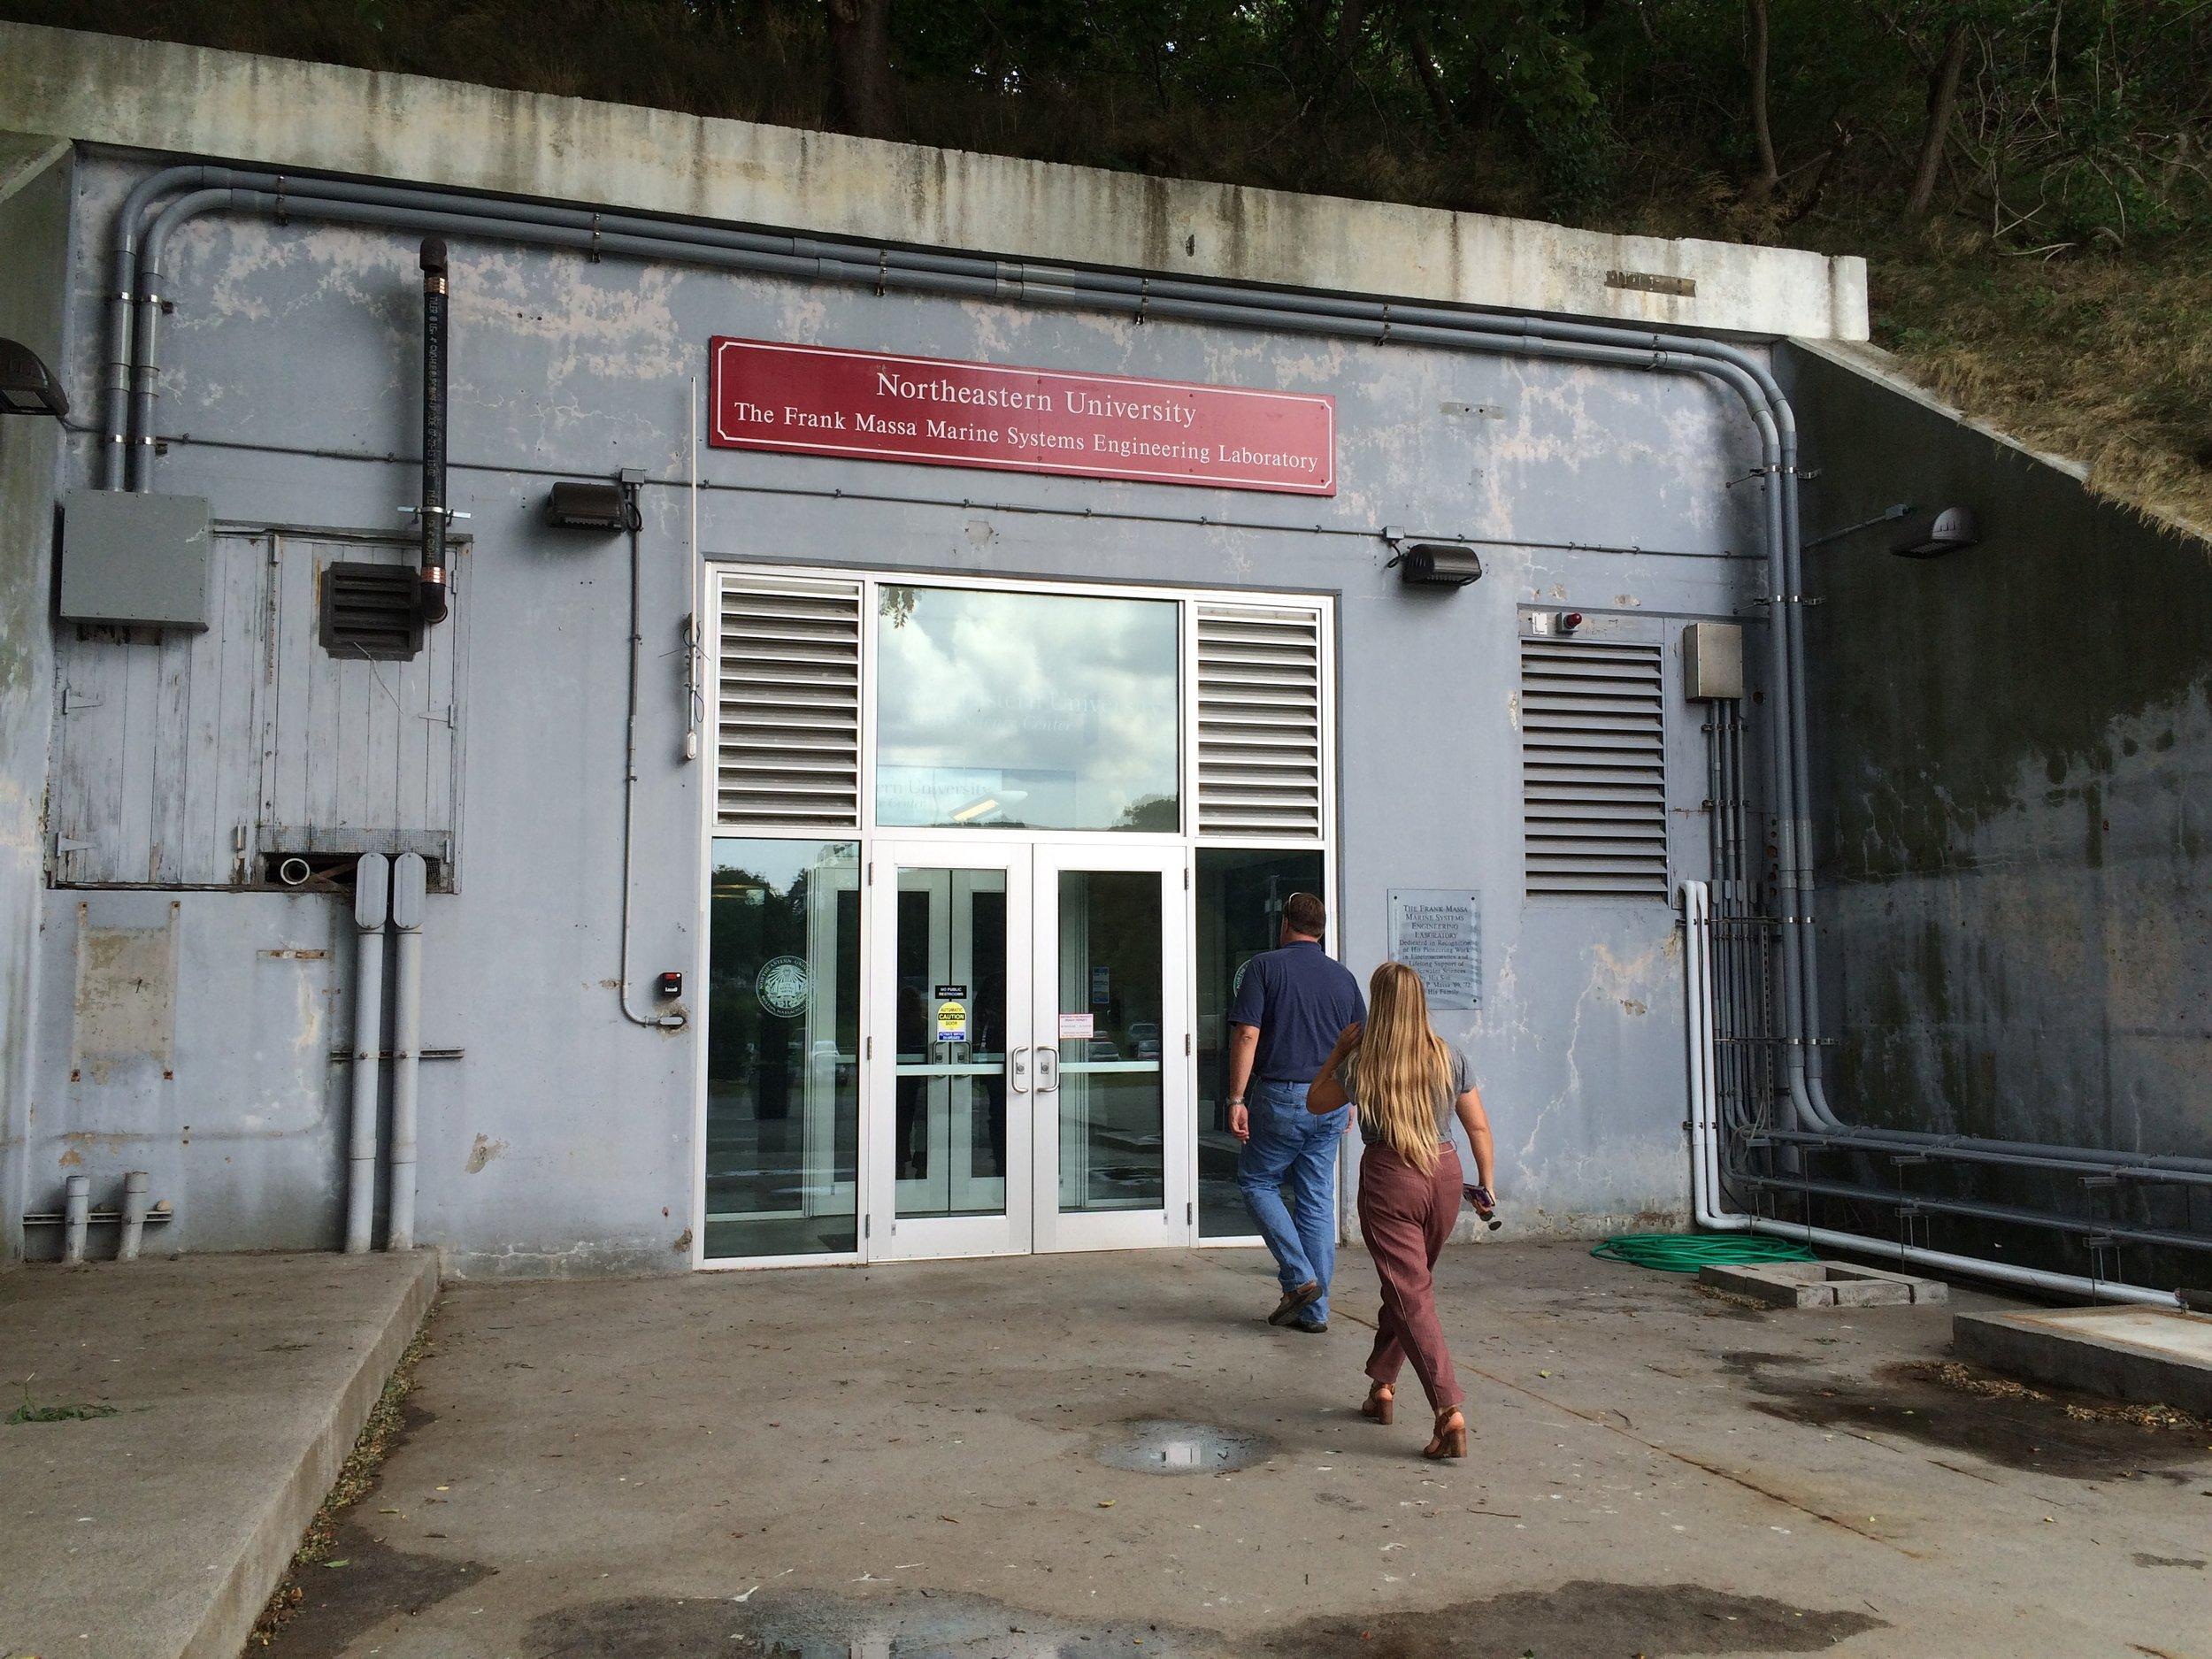 World War 2 bunker repurposed into a laboratory